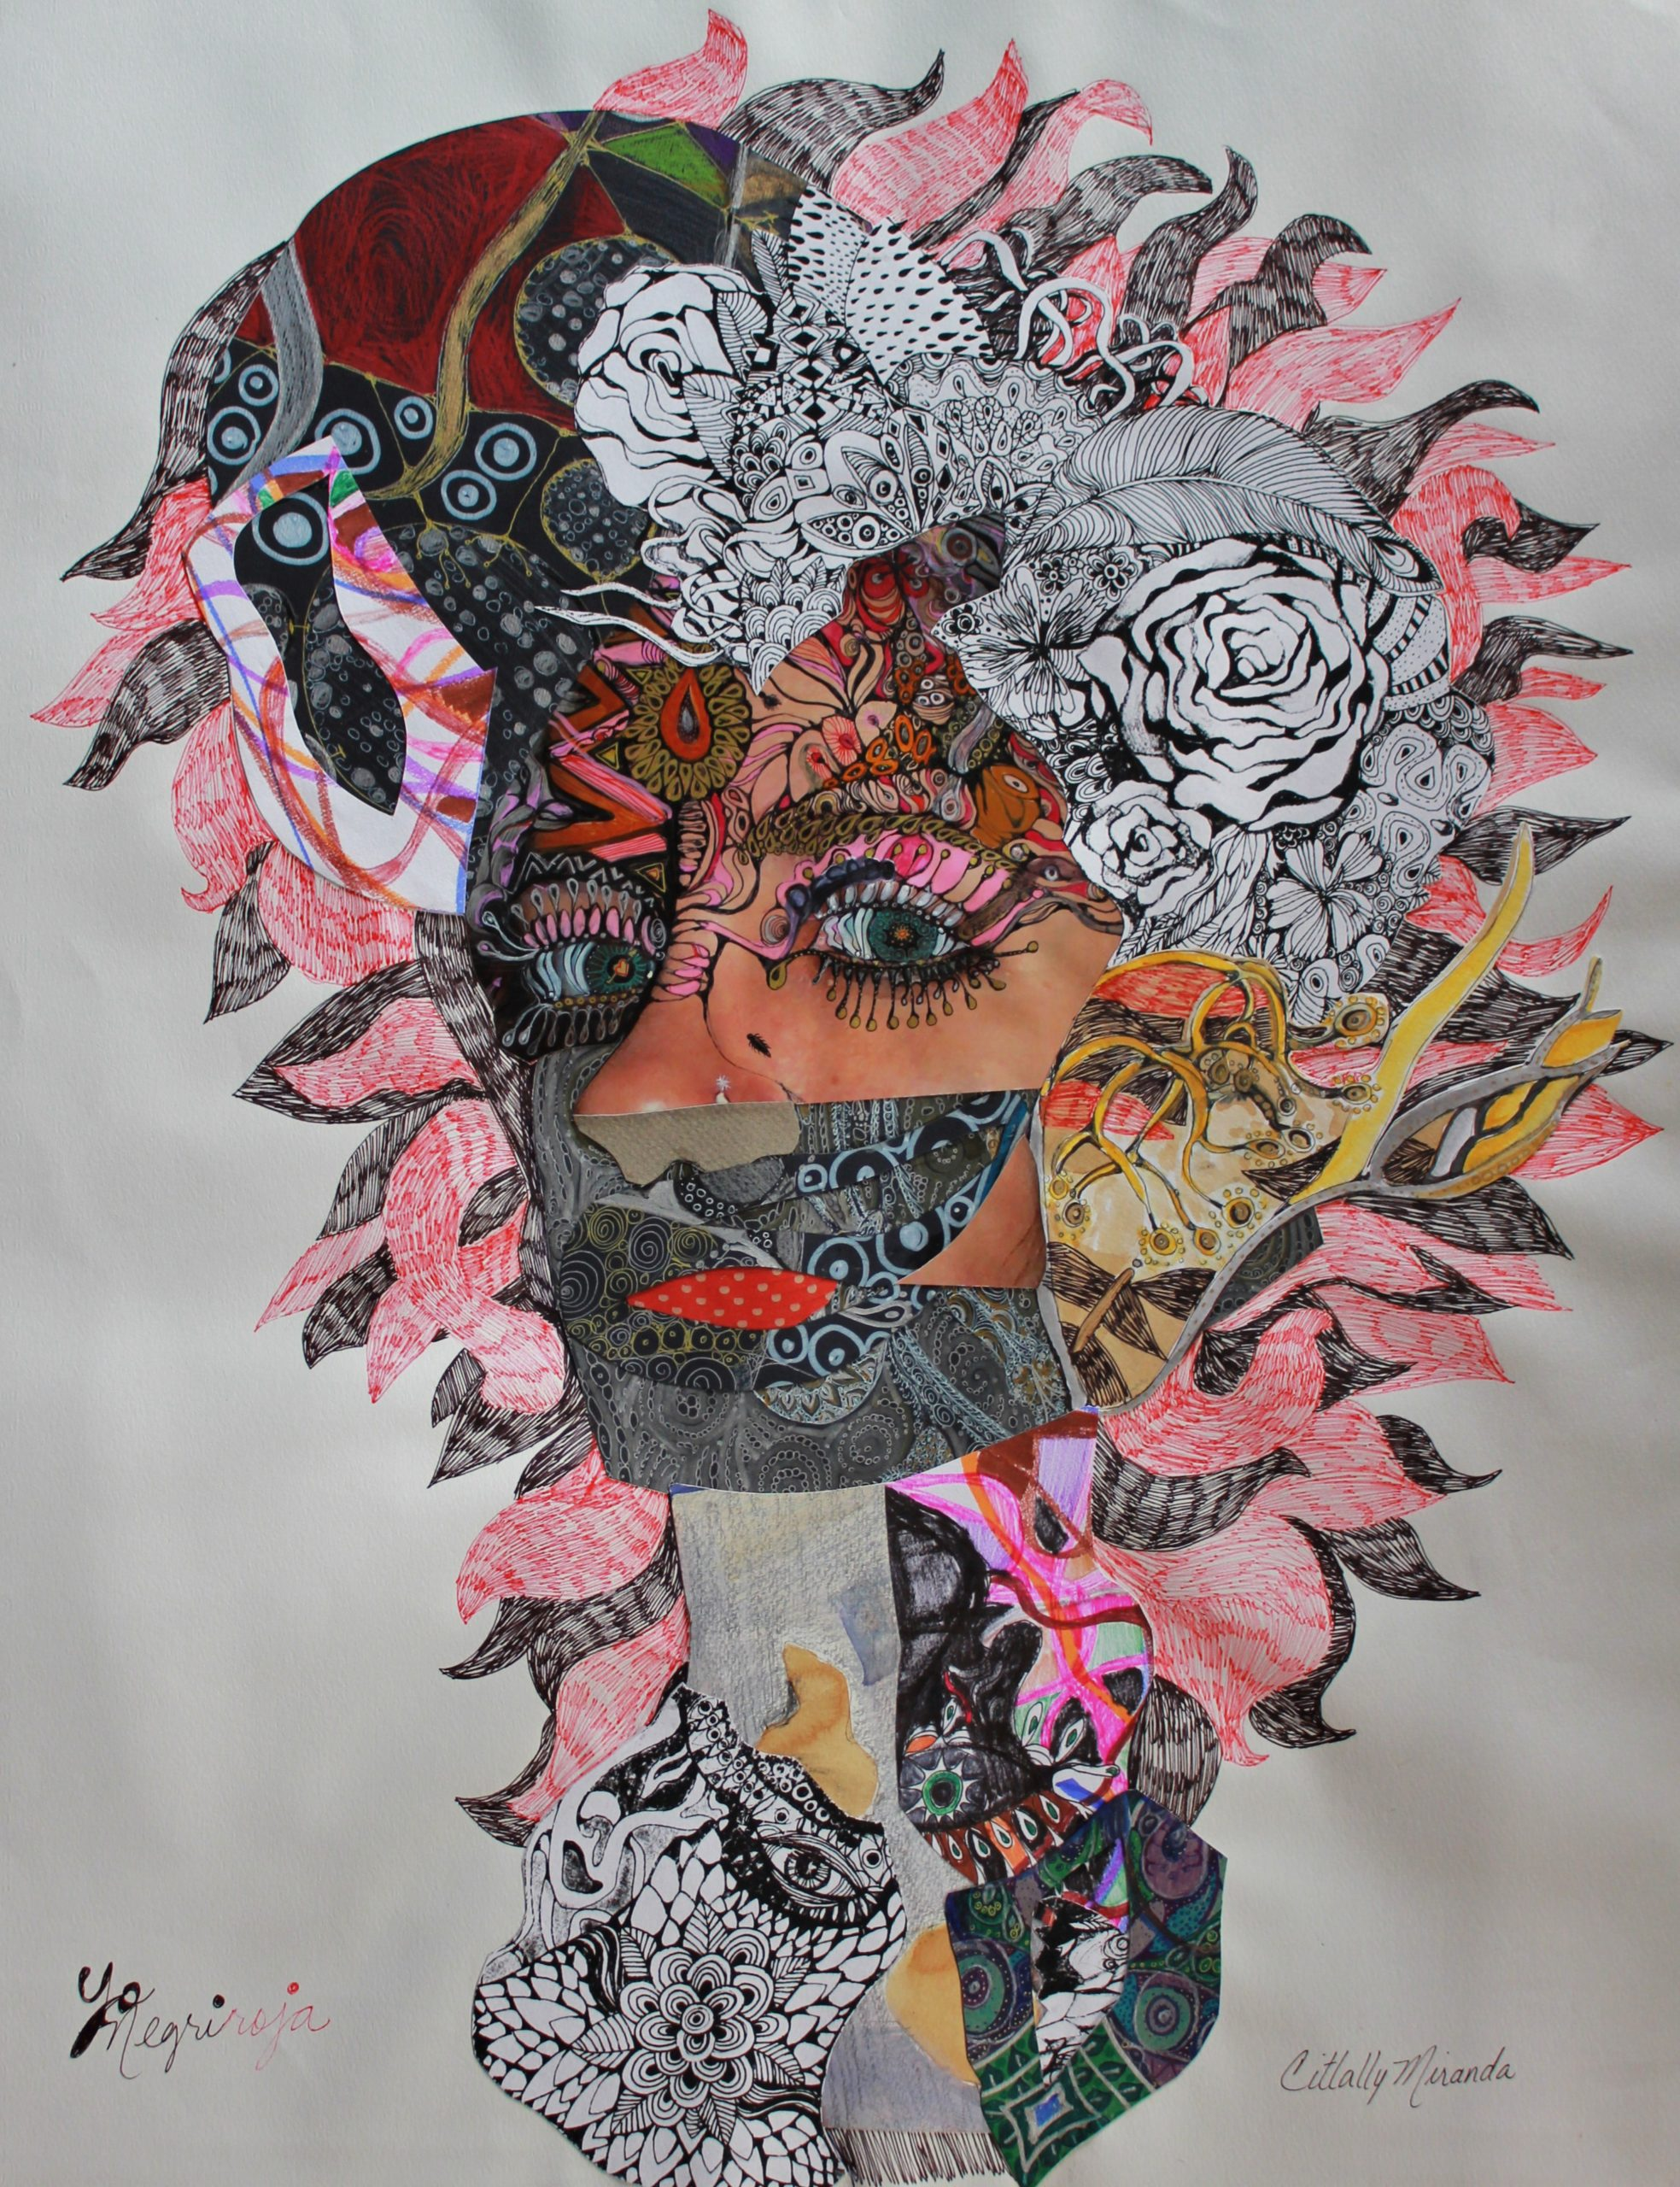 «Yo negriRoja» collage/dibujo/tinta/lápices sobre papel, 2008 CITLALLY MIRANDA. YLONKA NACIDIT-PERDOMO   VII MUJERES MIRANDO MUJERES